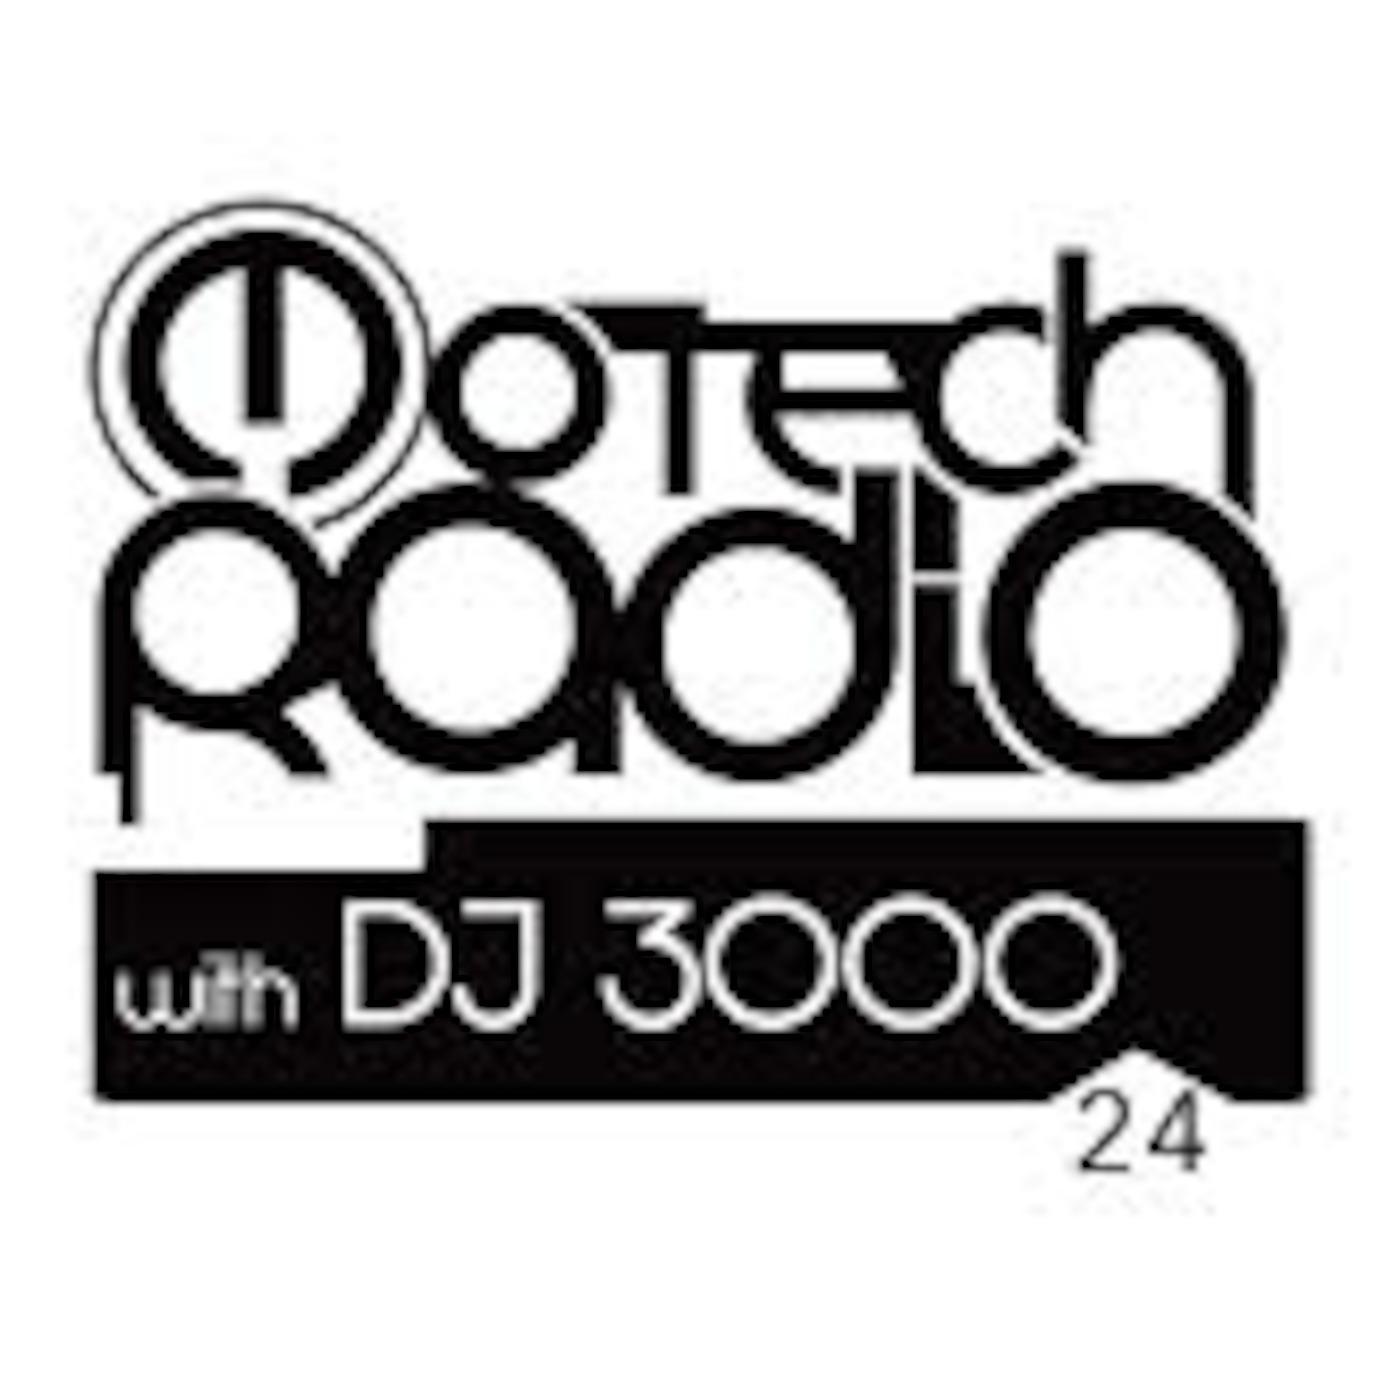 Motech Radio